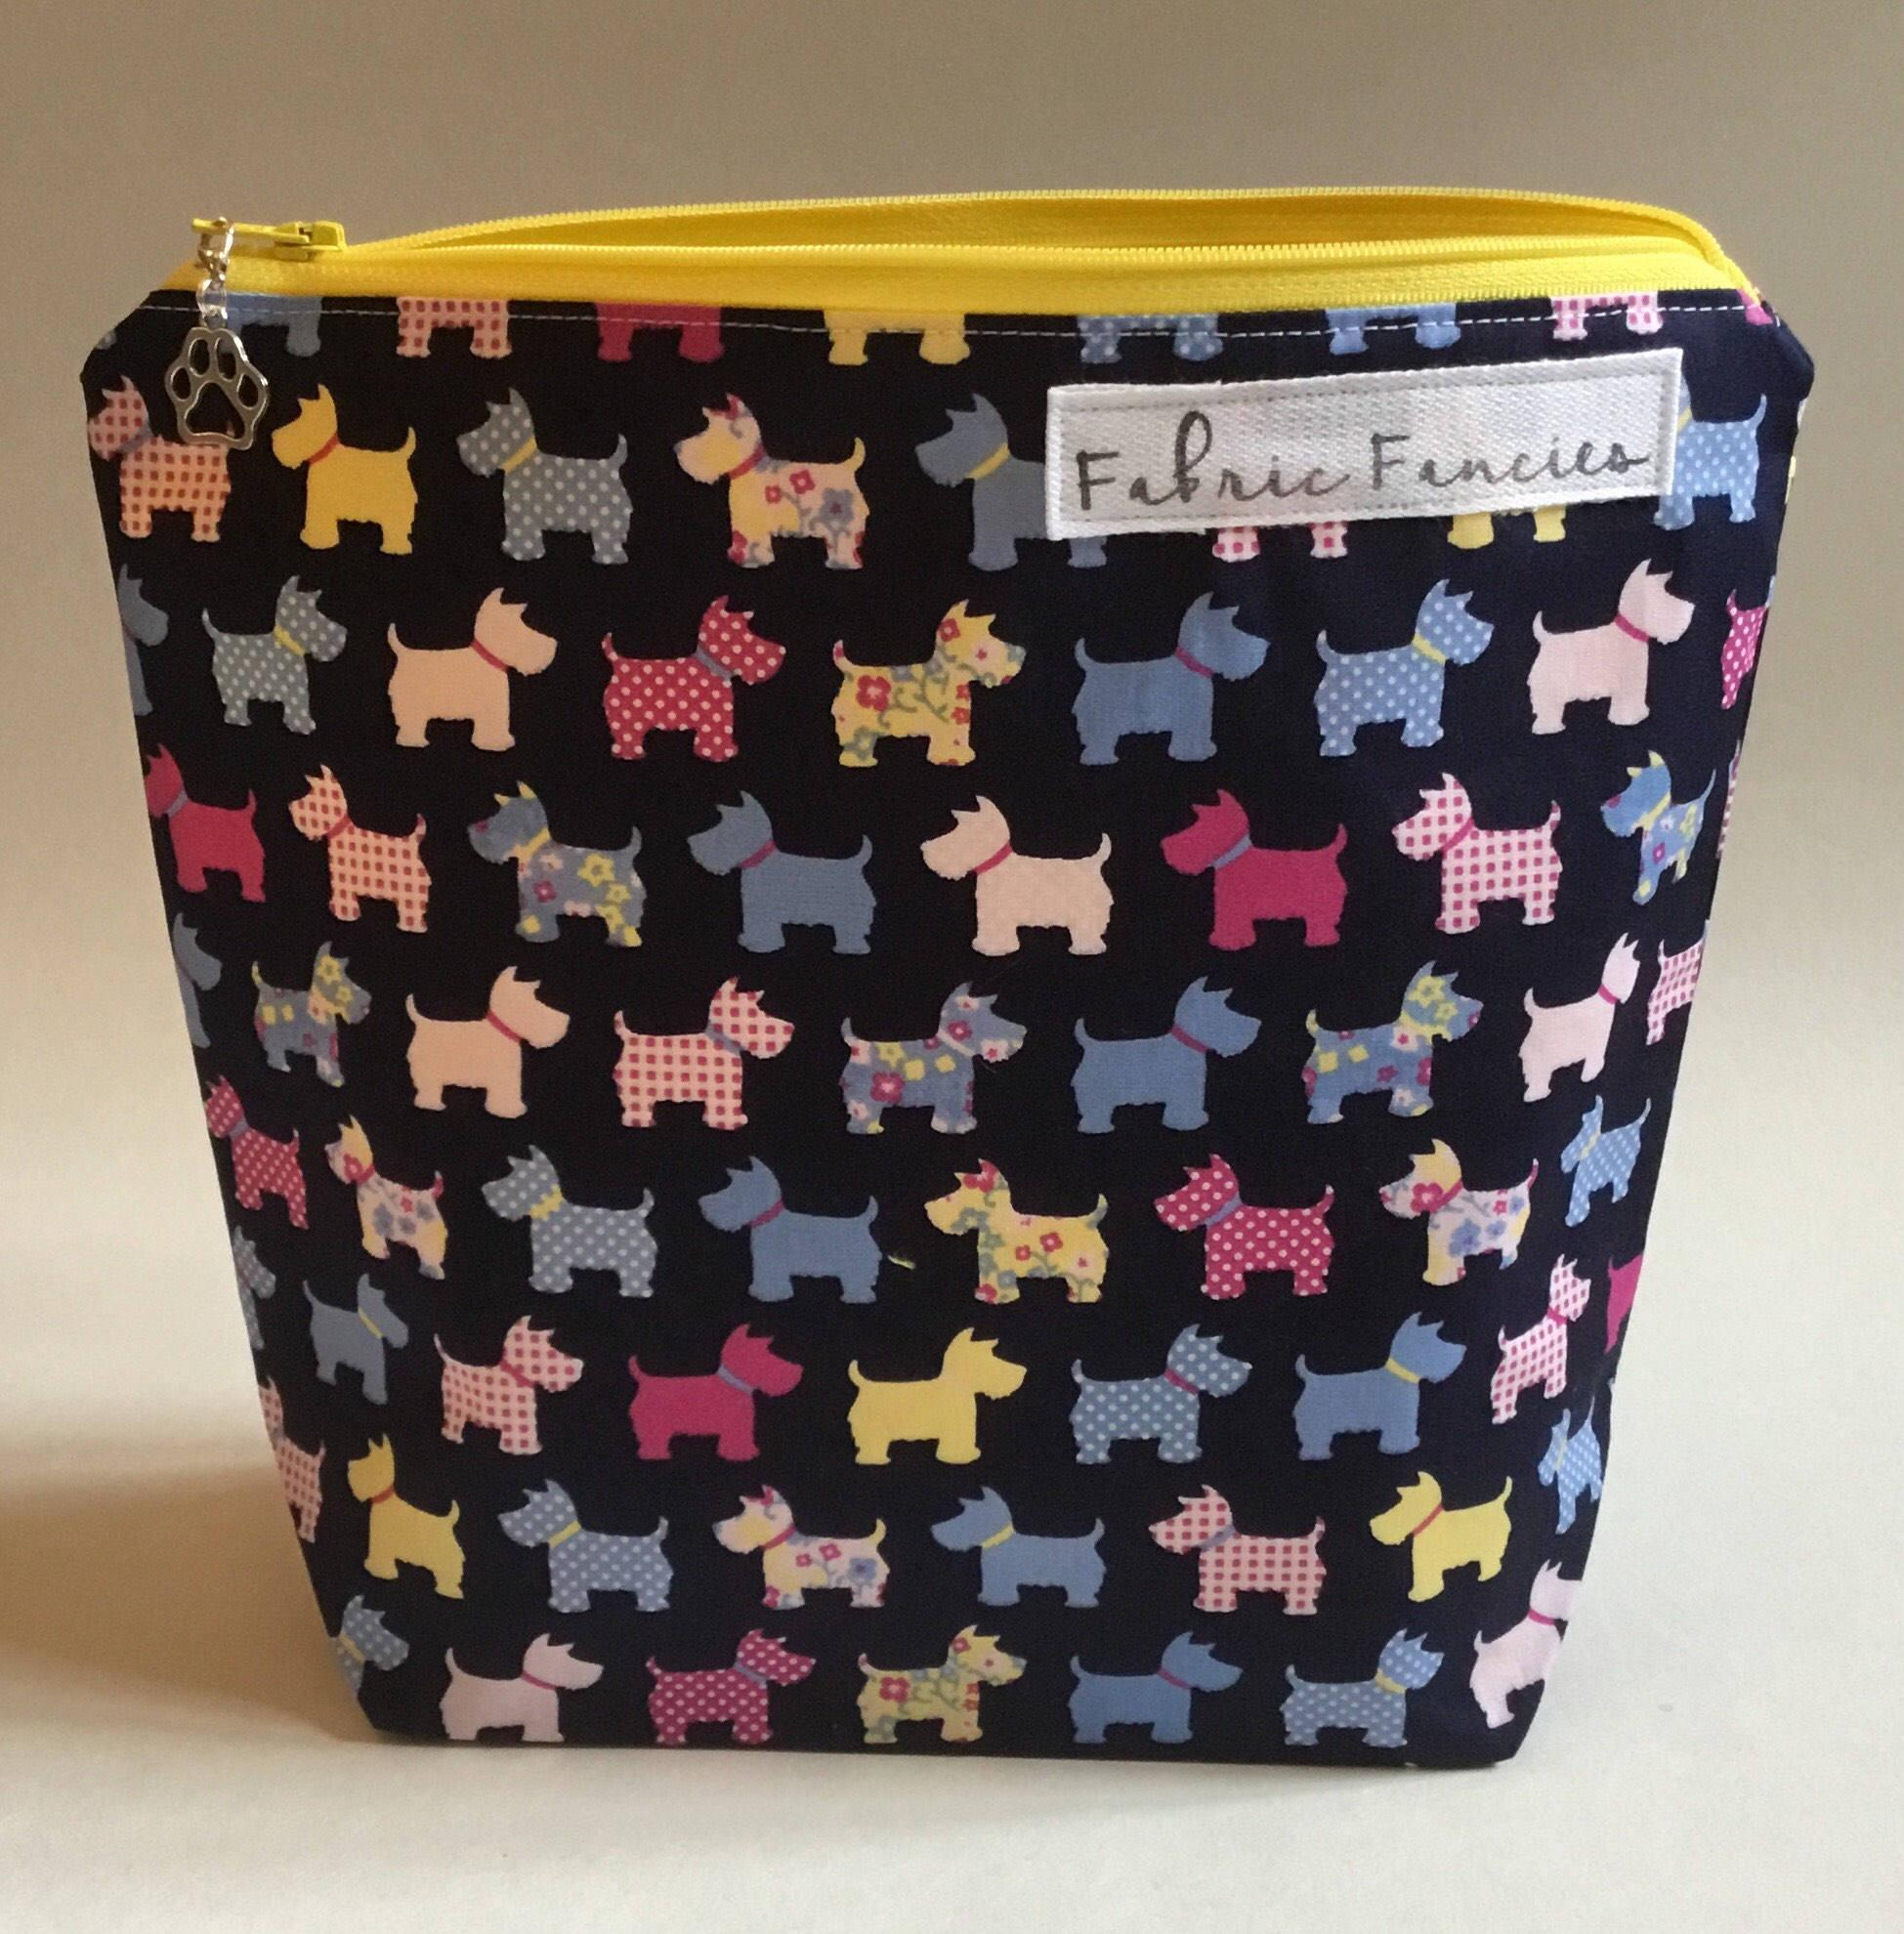 Project bag dog yarn pouch zipper bag cute yarn bag crochet knitting project